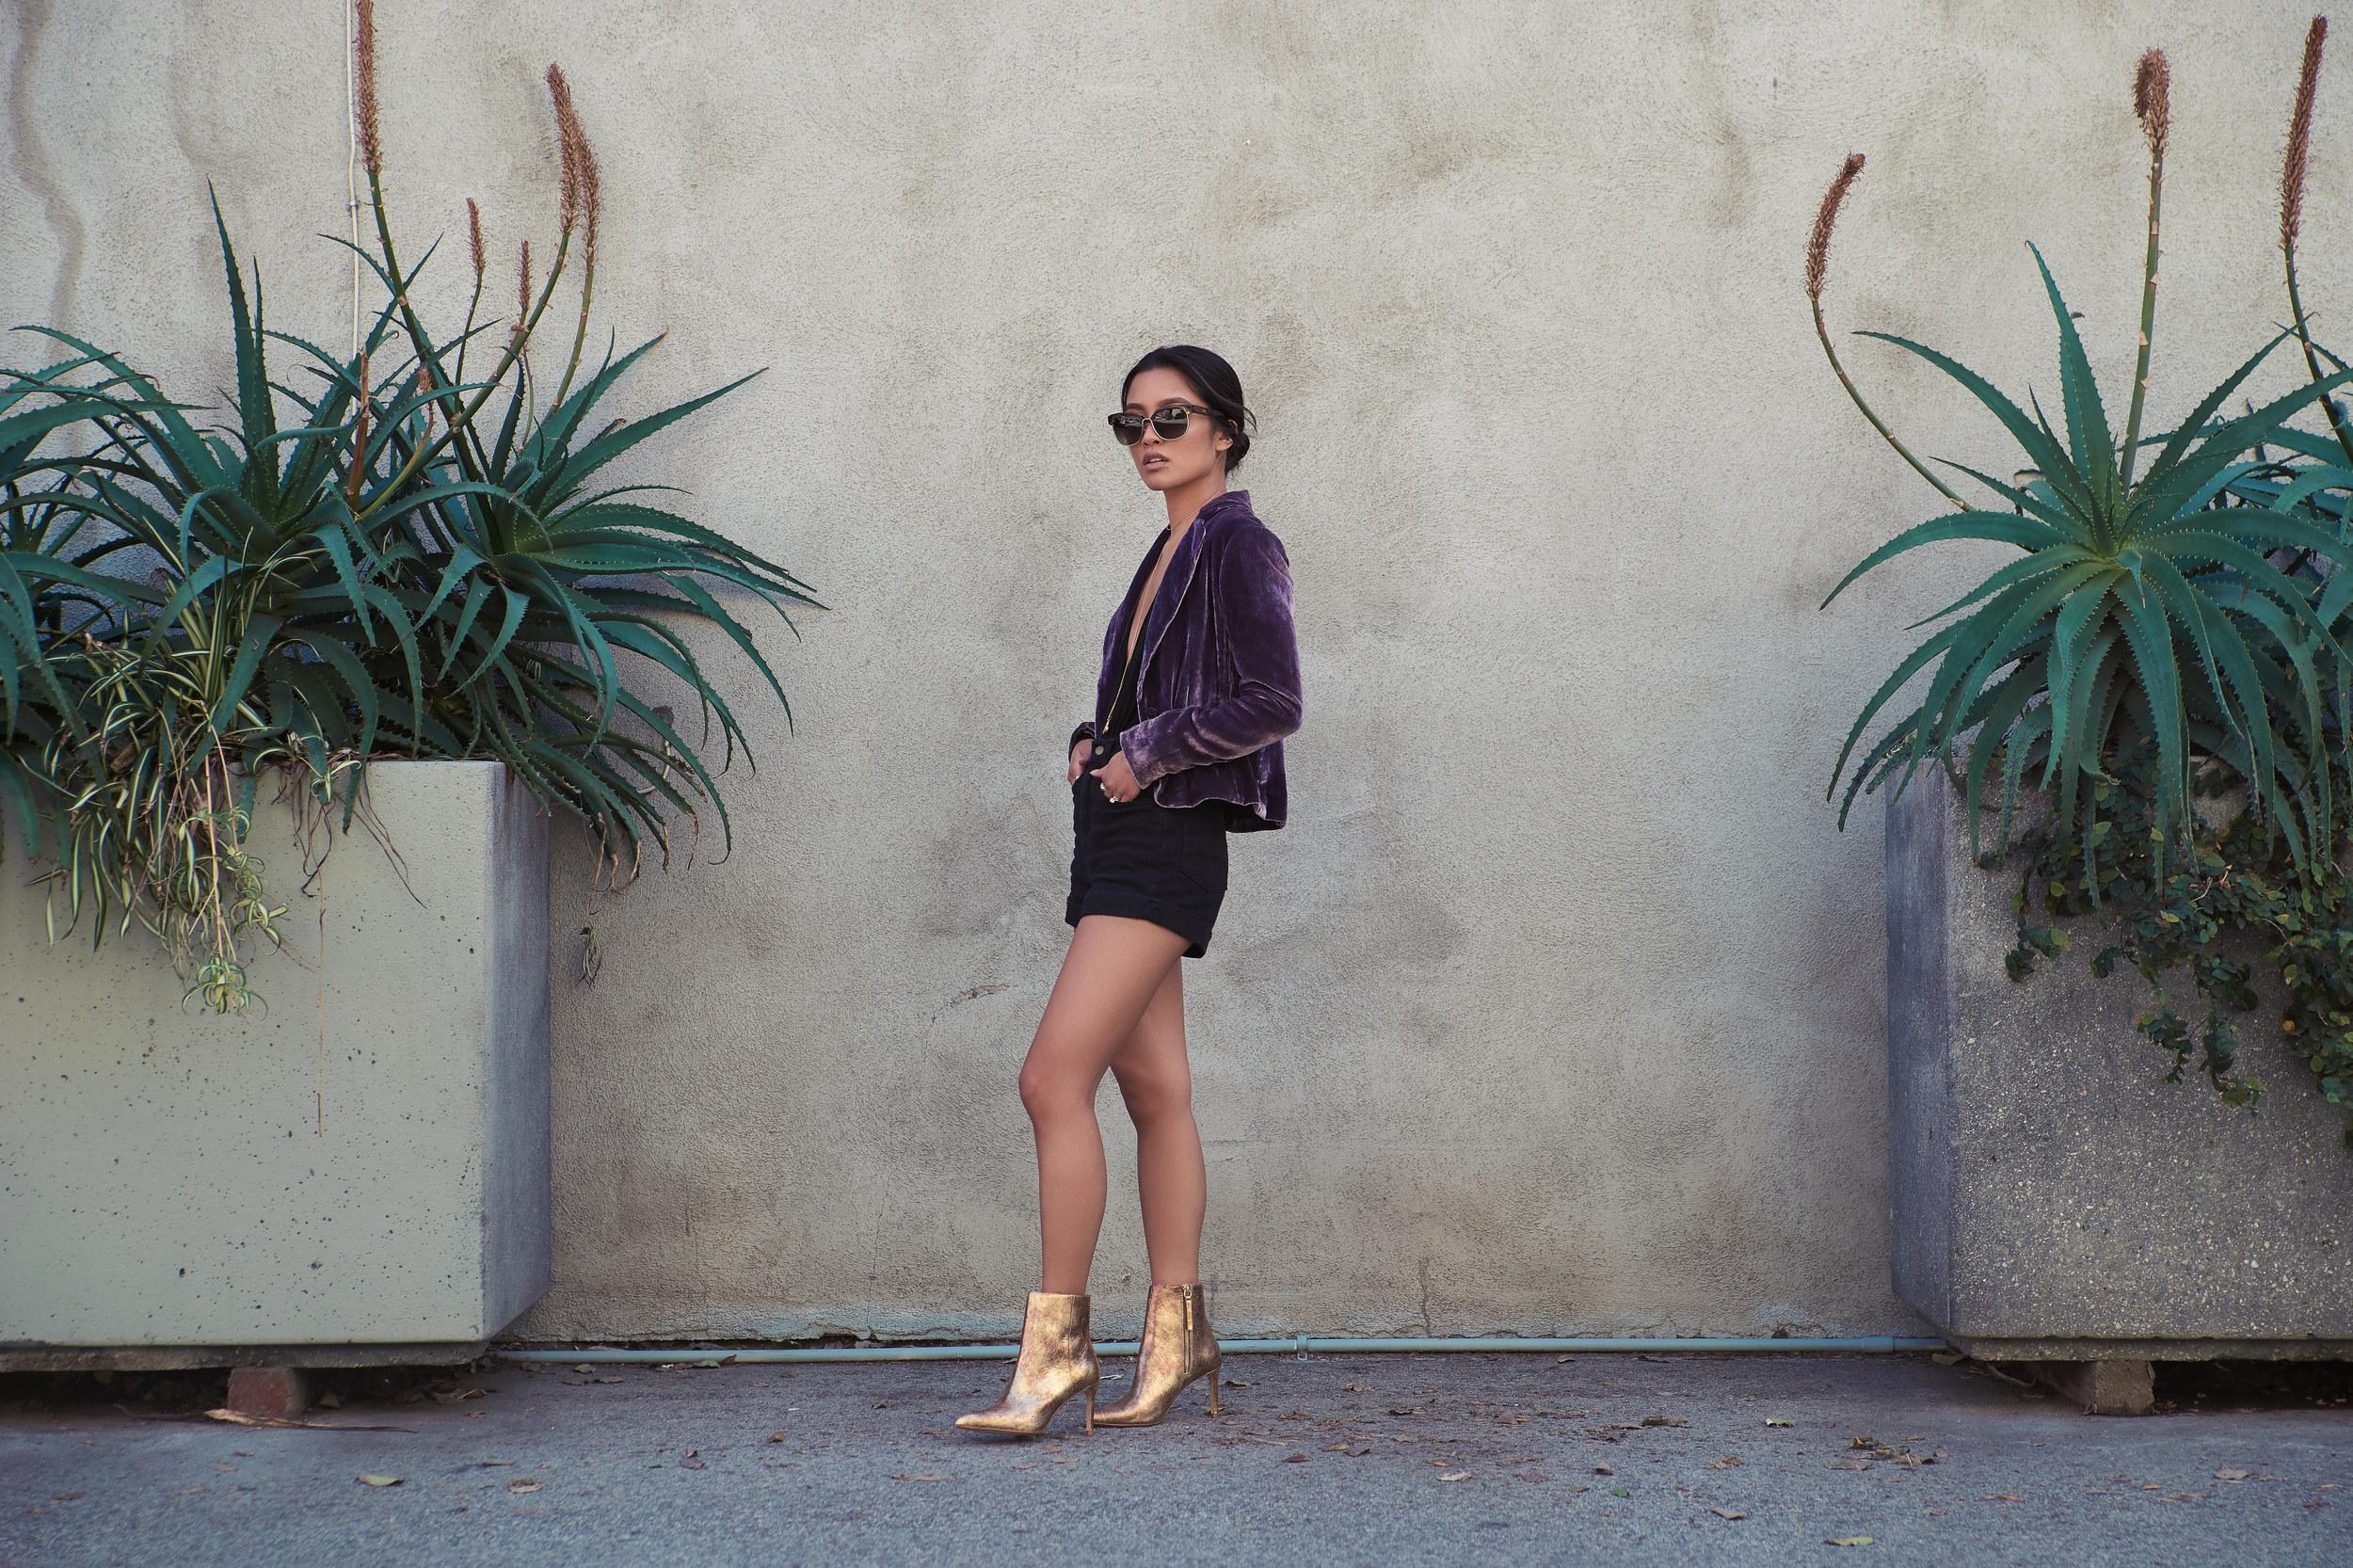 bcbg blazer (  s.  ) | missguided suit (  s.  ) | AA   shorts   | zara boots (  s.  ) | TT   choker   |TGK   necklace   | chloé sunnies (  s.  )                                                                                  photos by    sean martin